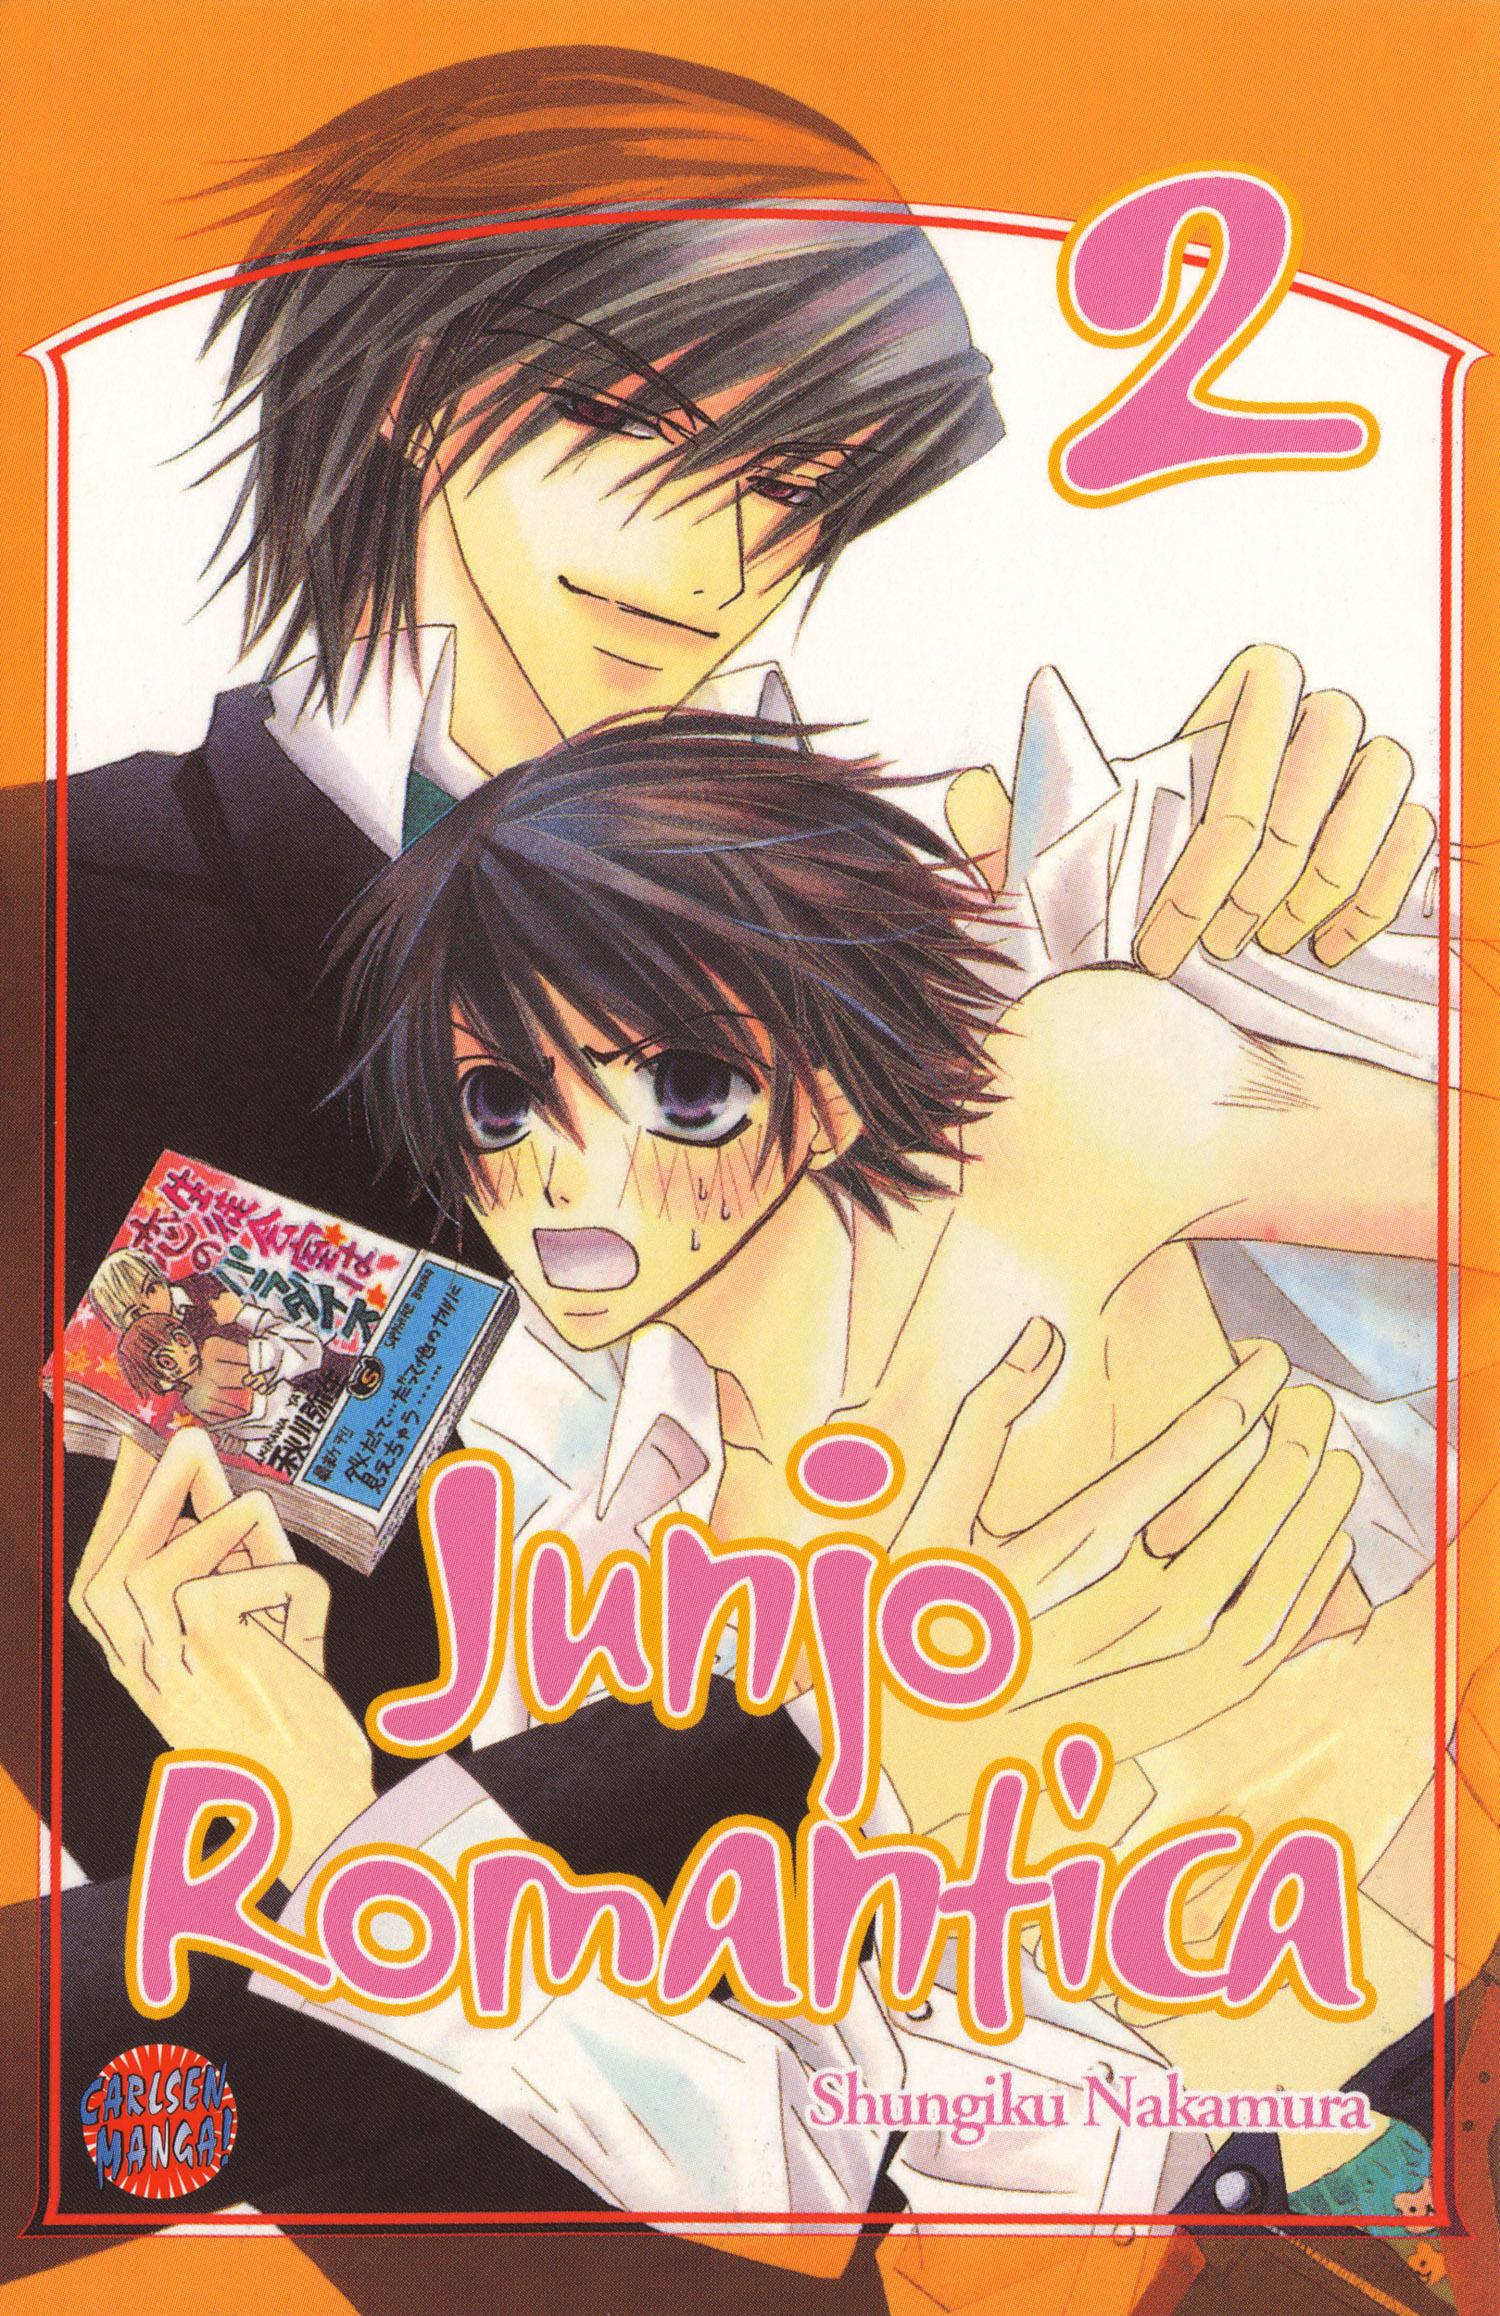 Junjou Romantica Manga Cover | www.imgkid.com - The Image ...